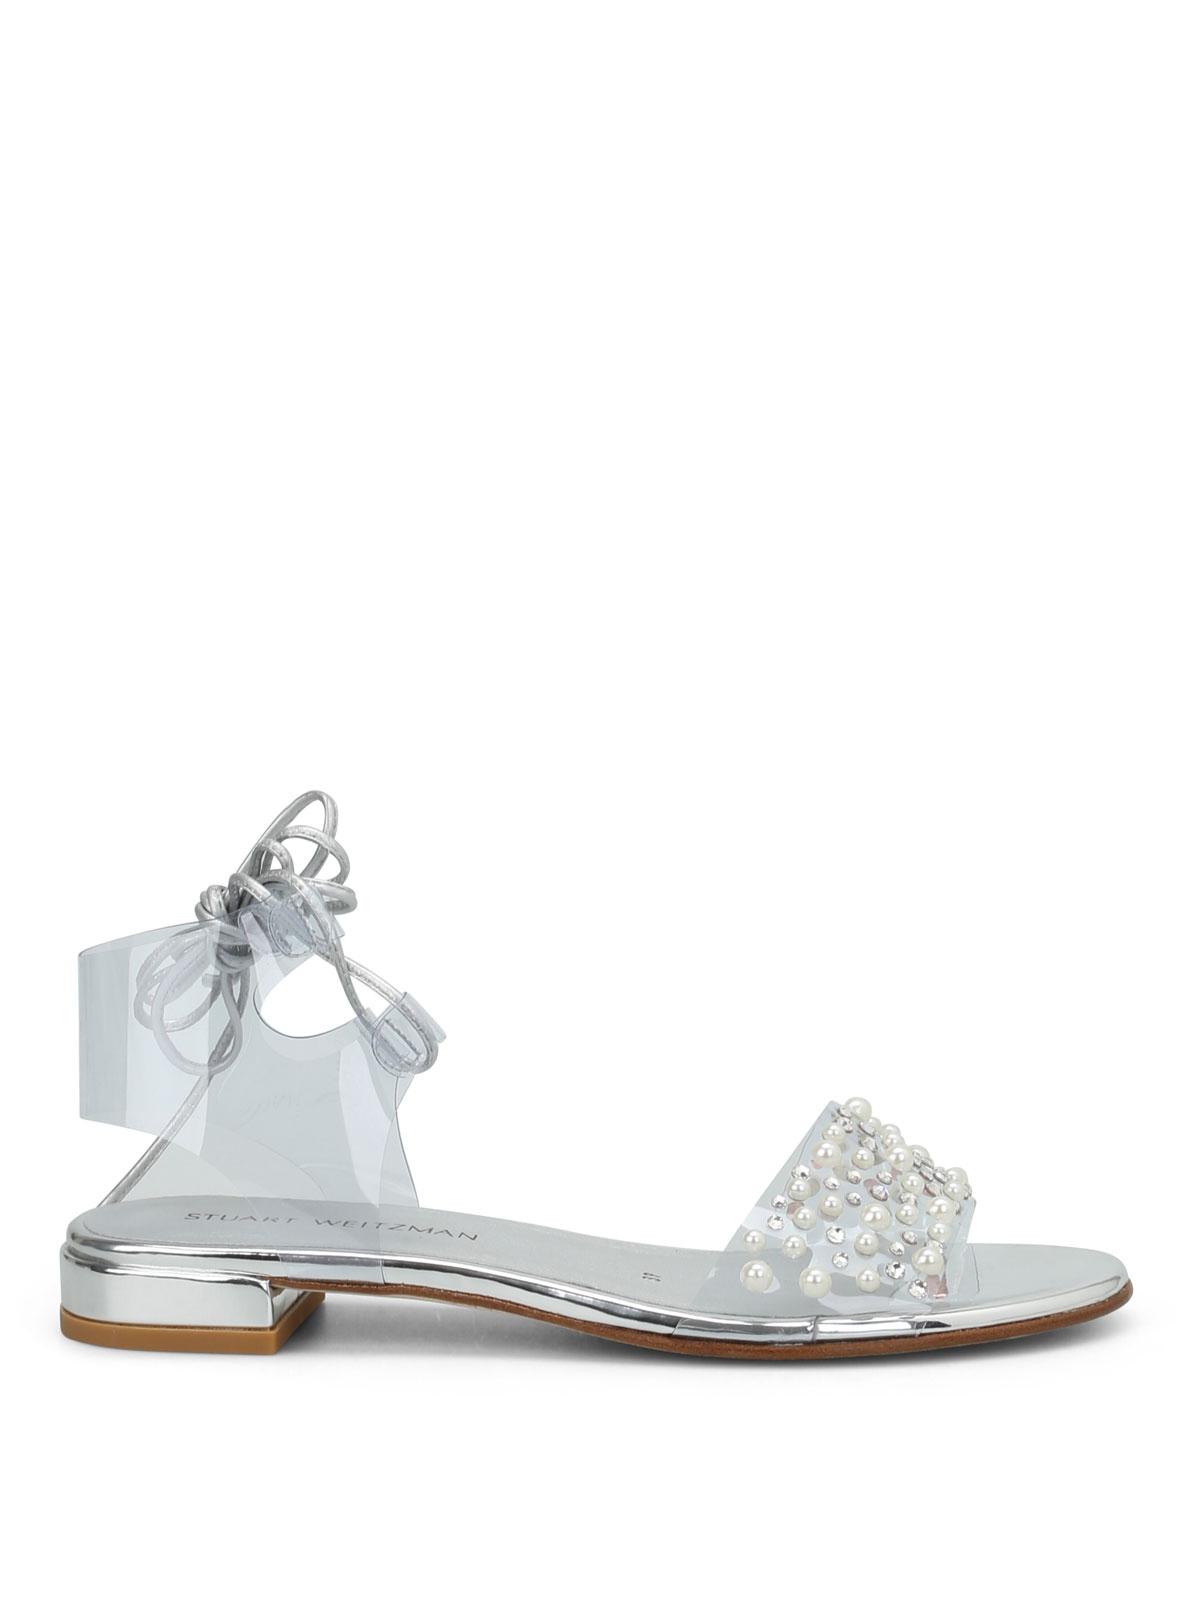 a315a2367dcfc Stuart Weitzman - Solarium embellished sandals - sandals - VL76239